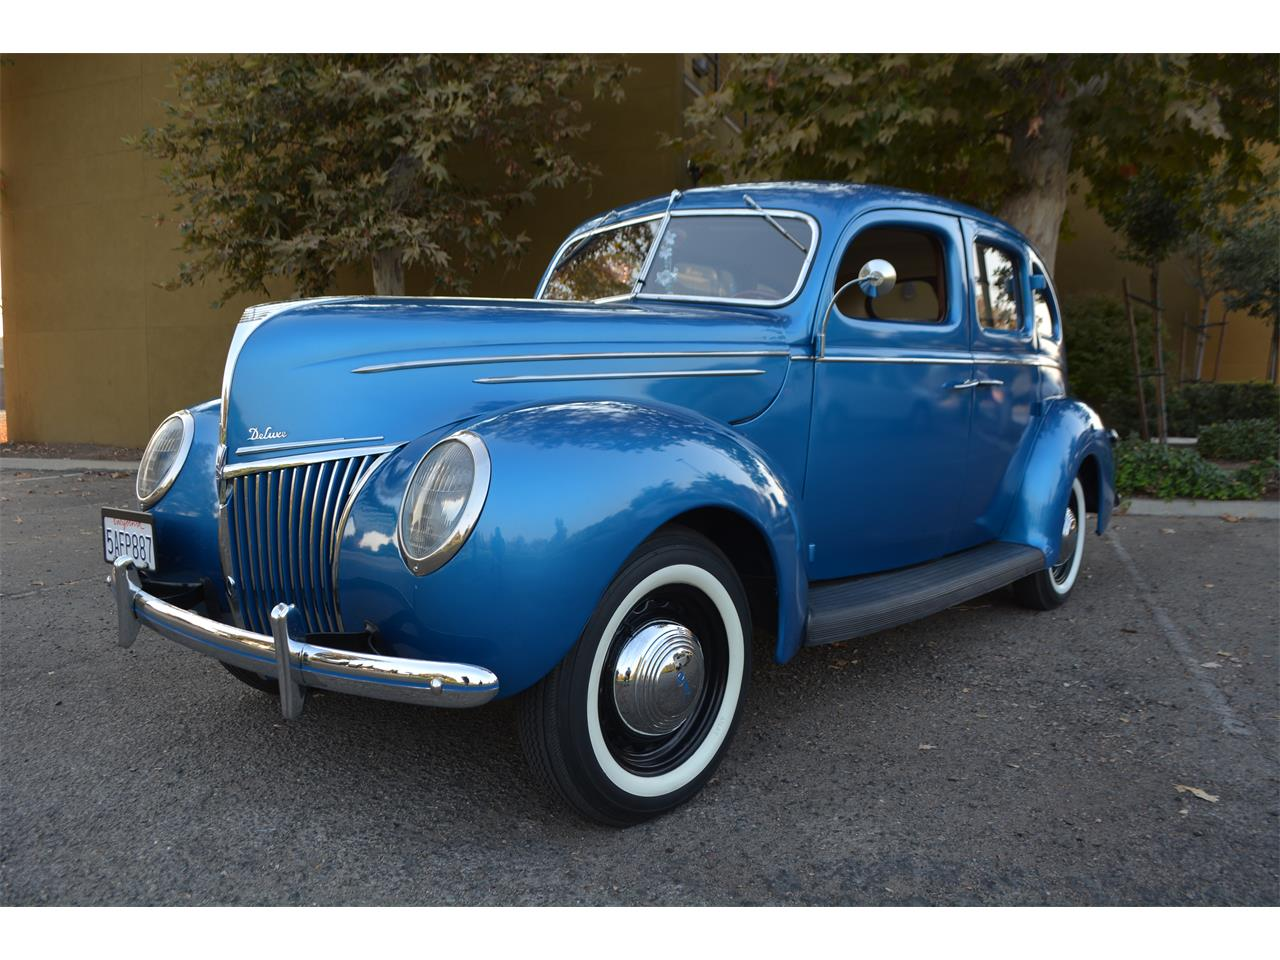 Visalia Car Dealers >> 1939 Ford Coupe for Sale | ClassicCars.com | CC-1165032